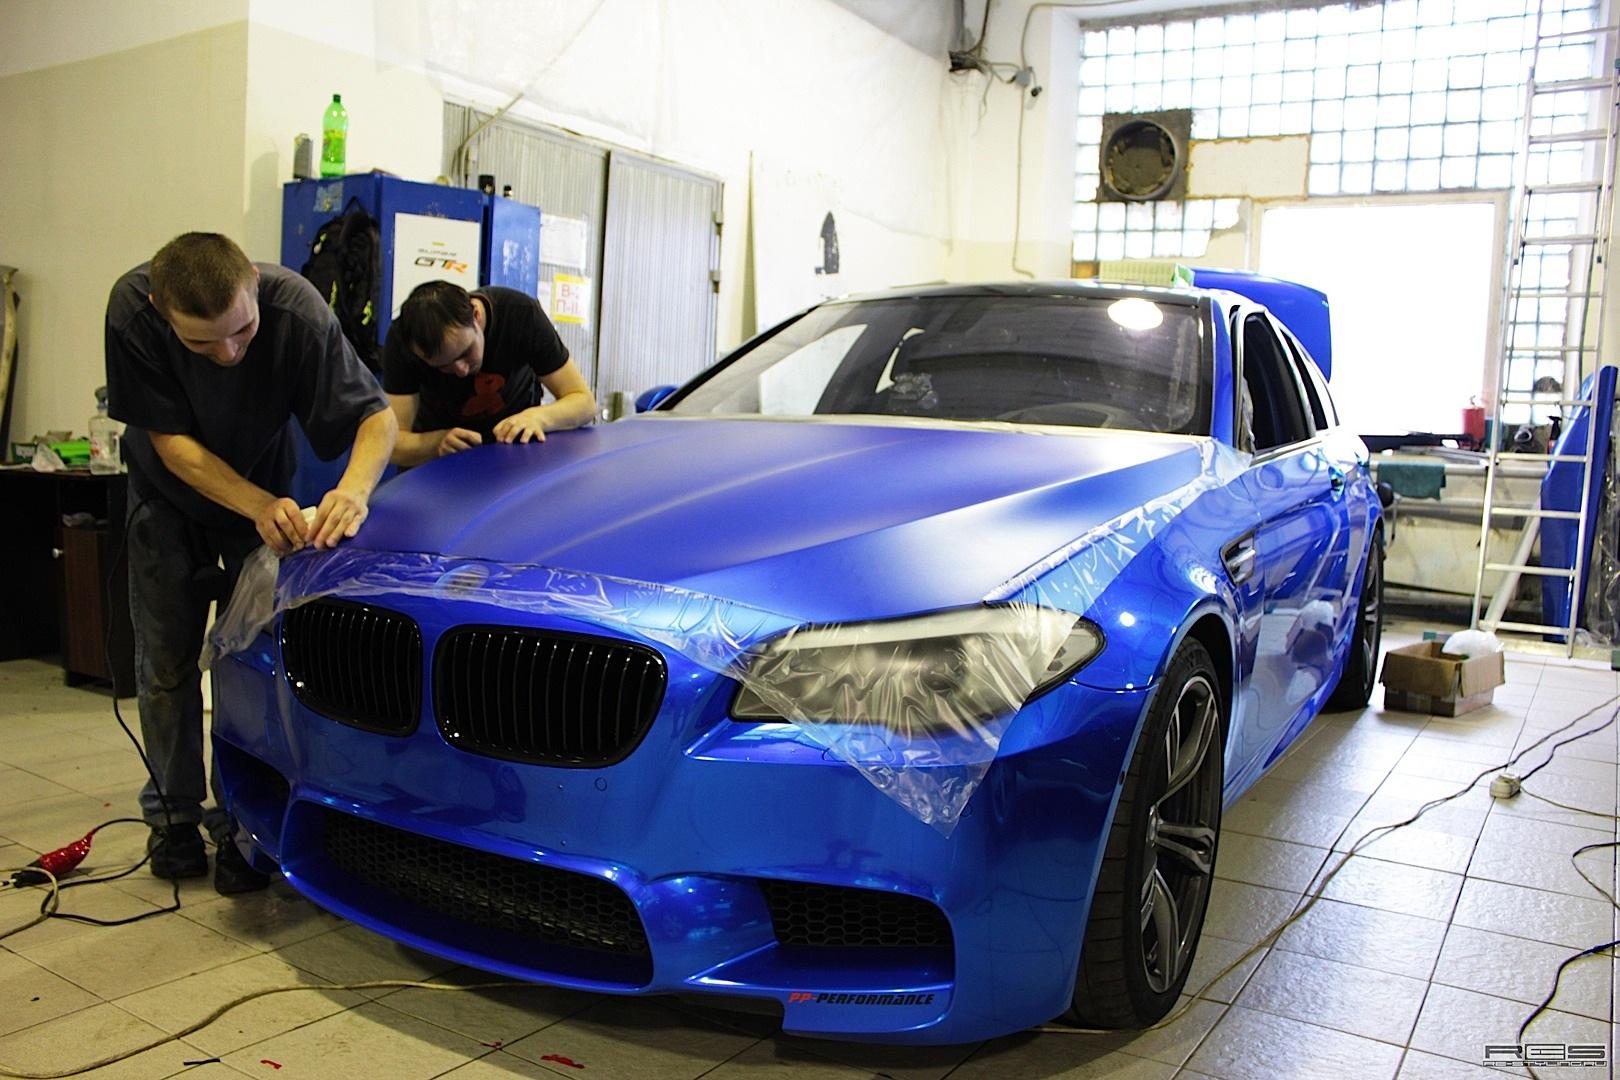 F10 BMW M5 in Blue Satin Chrome - autoevolution